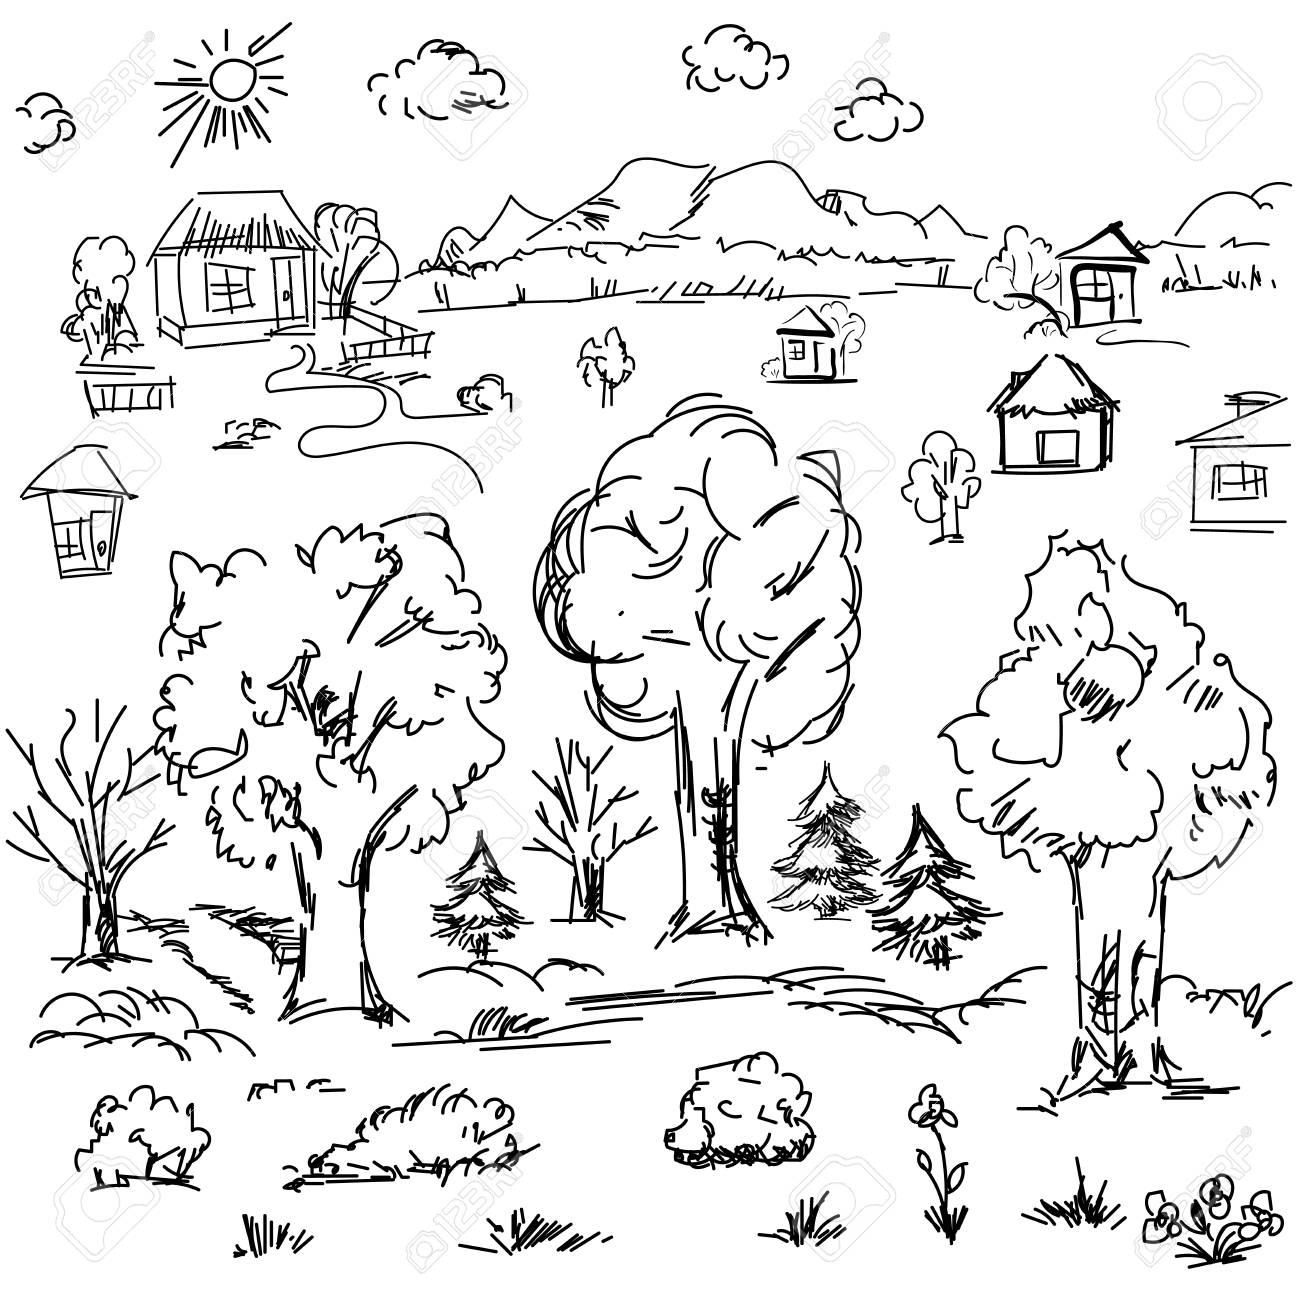 1300x1300 Elements Of Landscape In Outline. Doodle Sketch Outdoor Elements